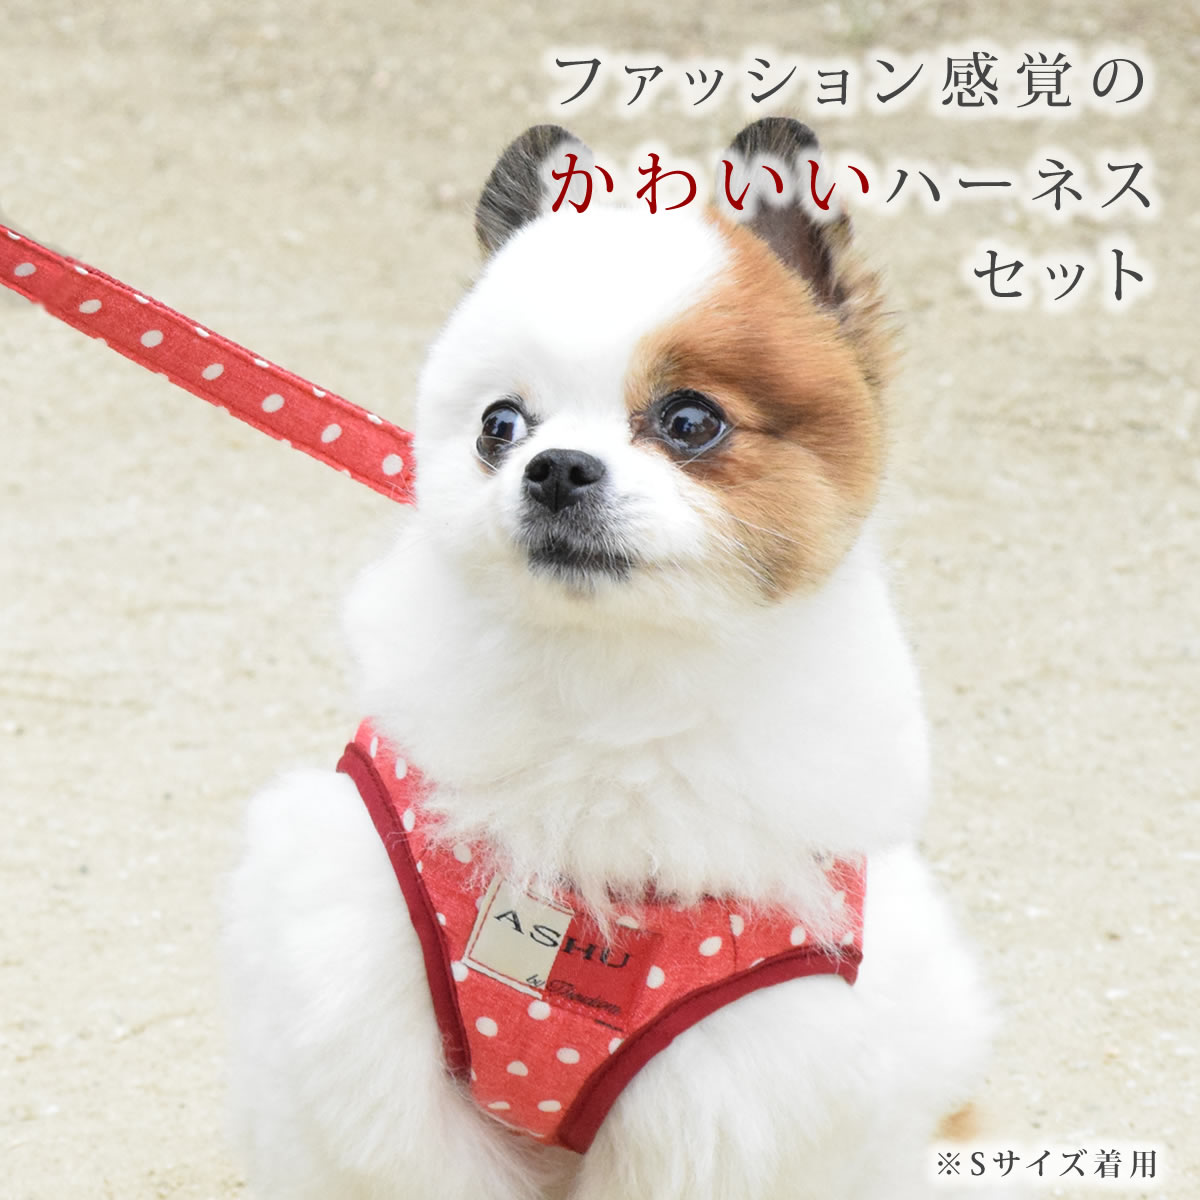 ASHUウェアハーネス水玉&リードセット LLサイズ(中型犬用)